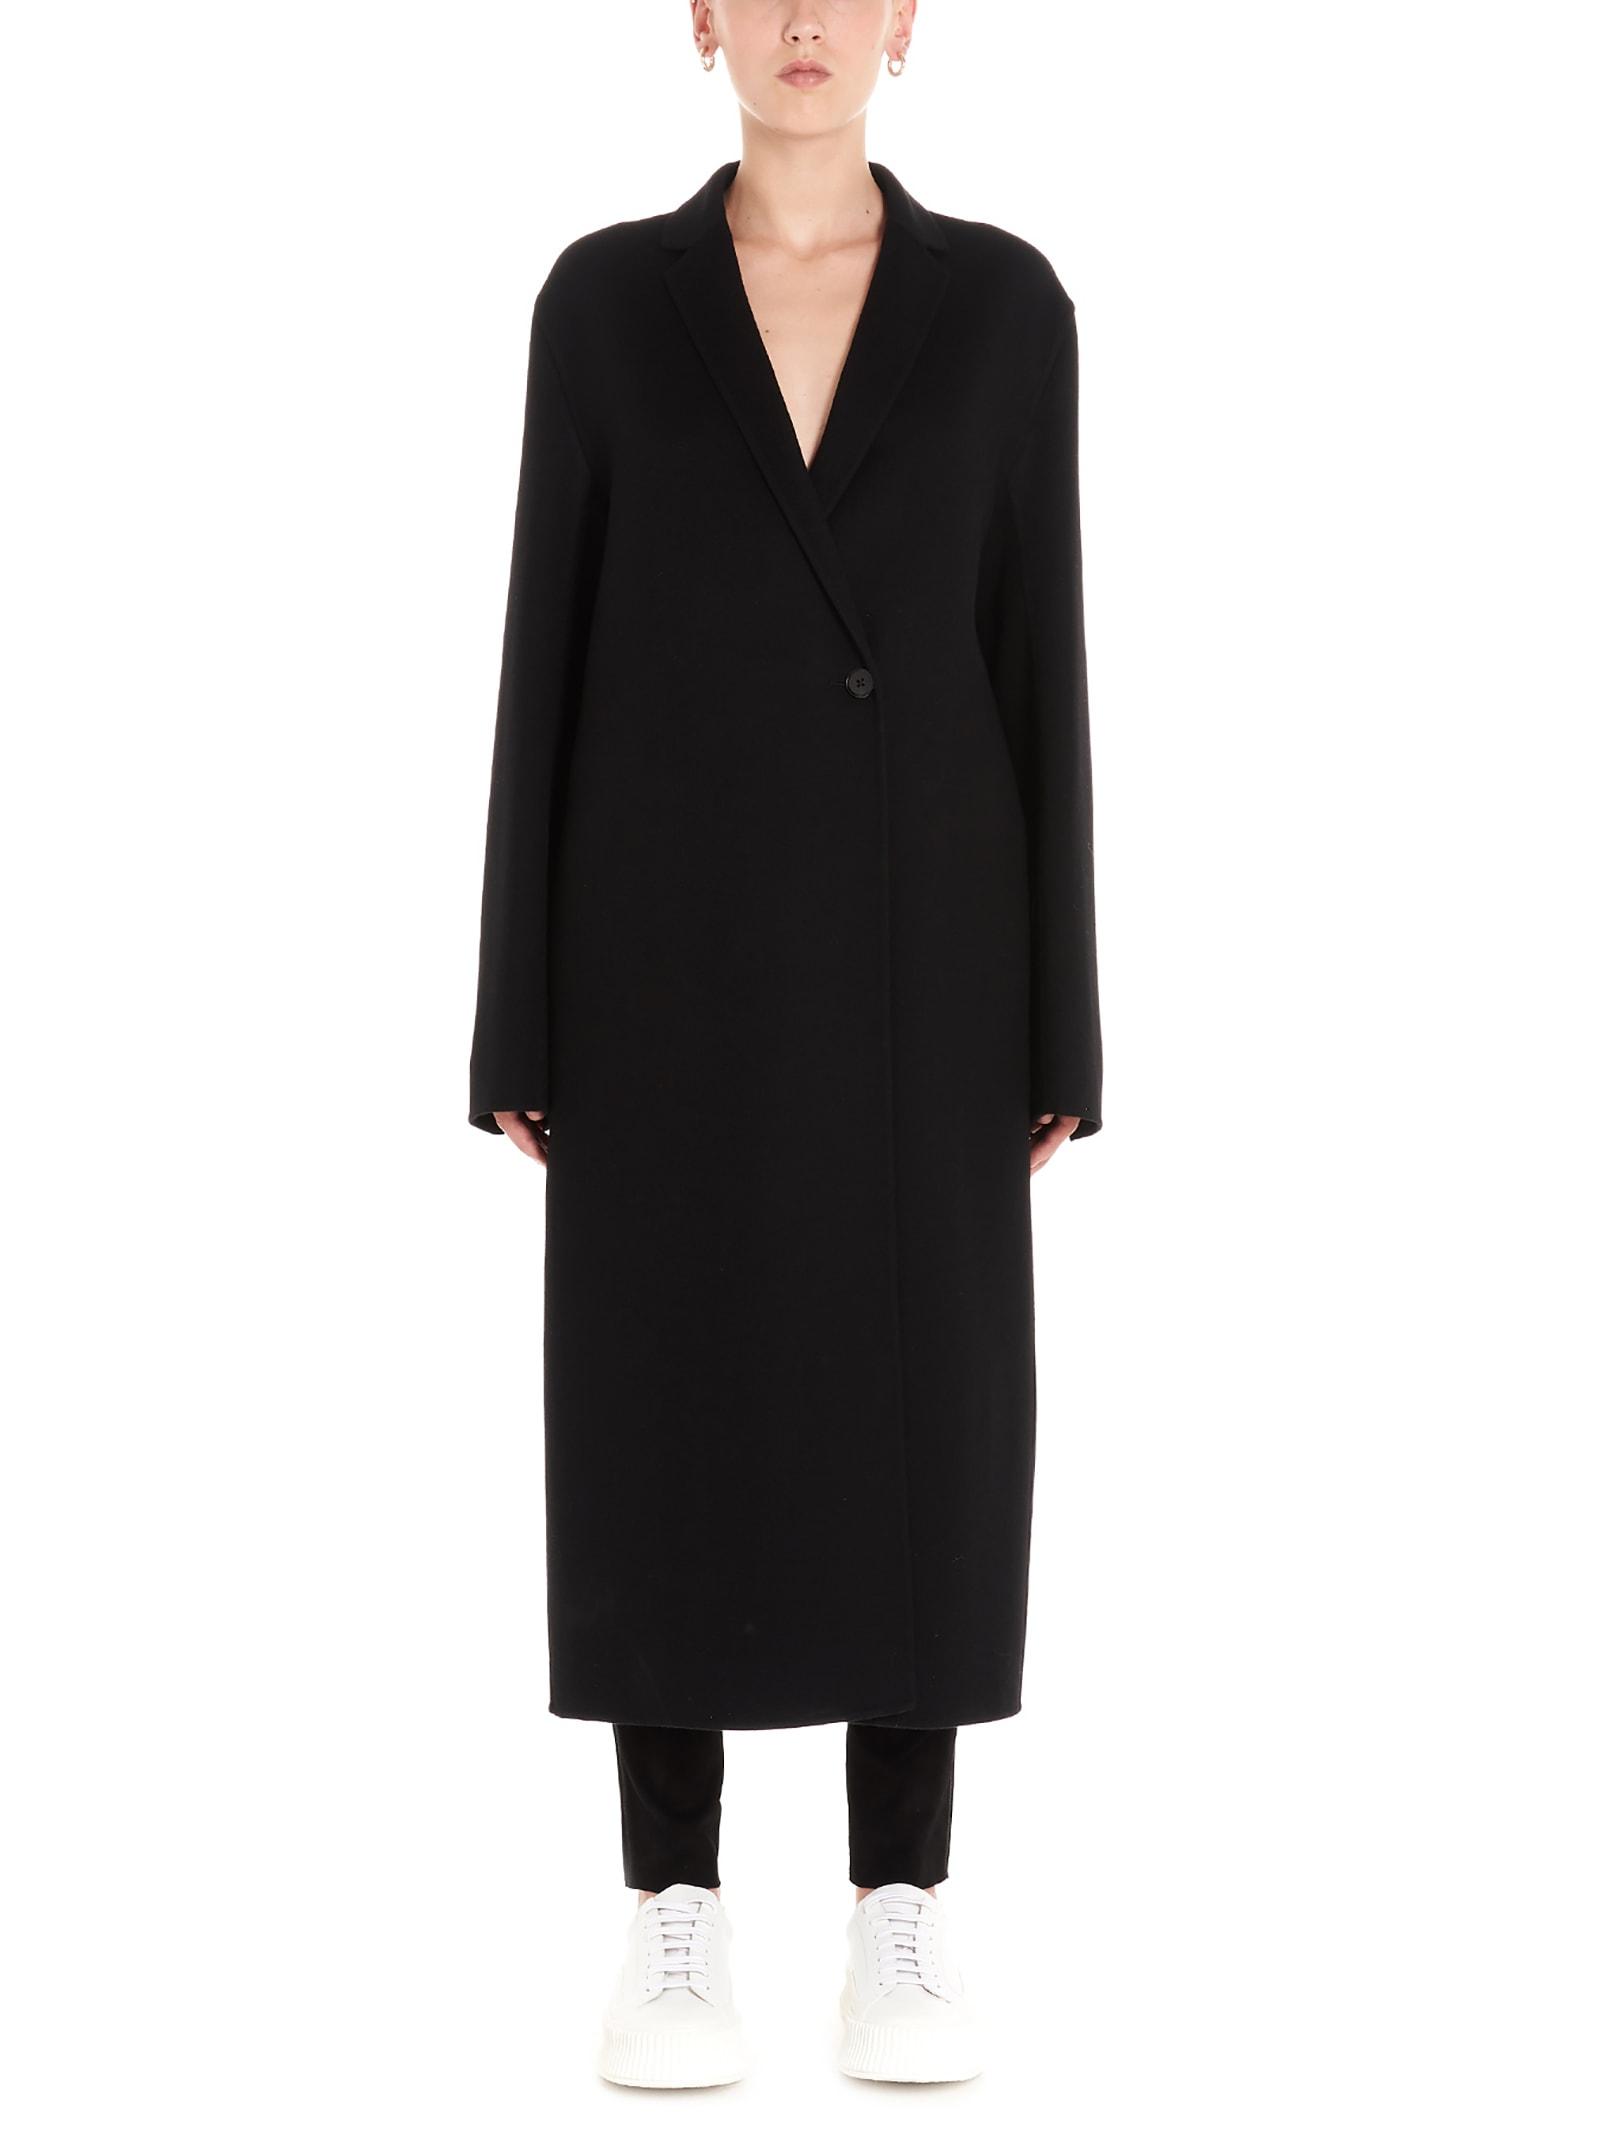 Jil Sander lebron Coat